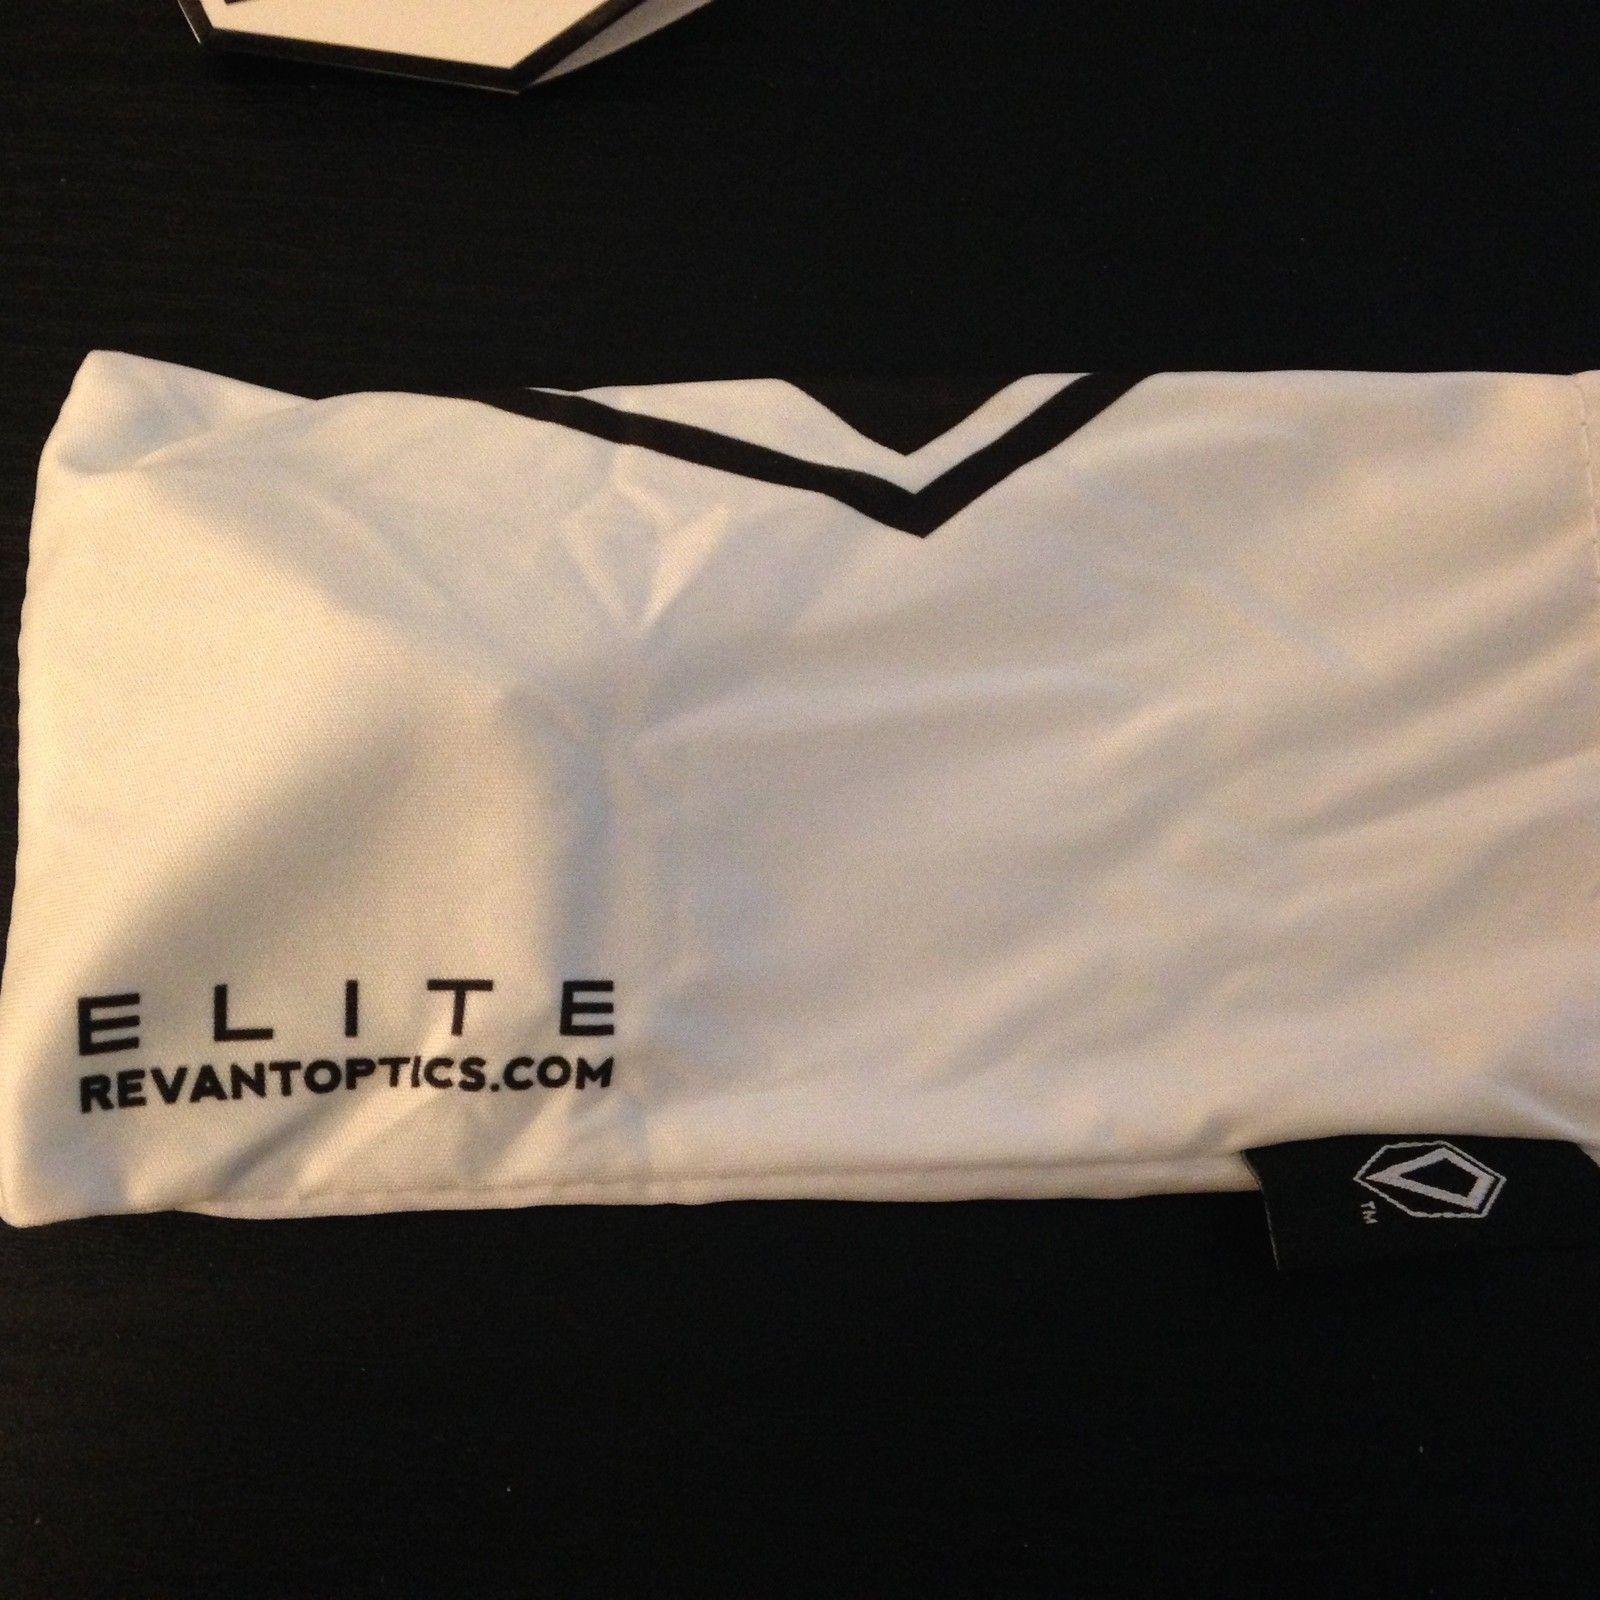 Revant Optics HC3 Elite Fuel Cell Lens Review - Revant_Optics_Microfiber_bag.jpg